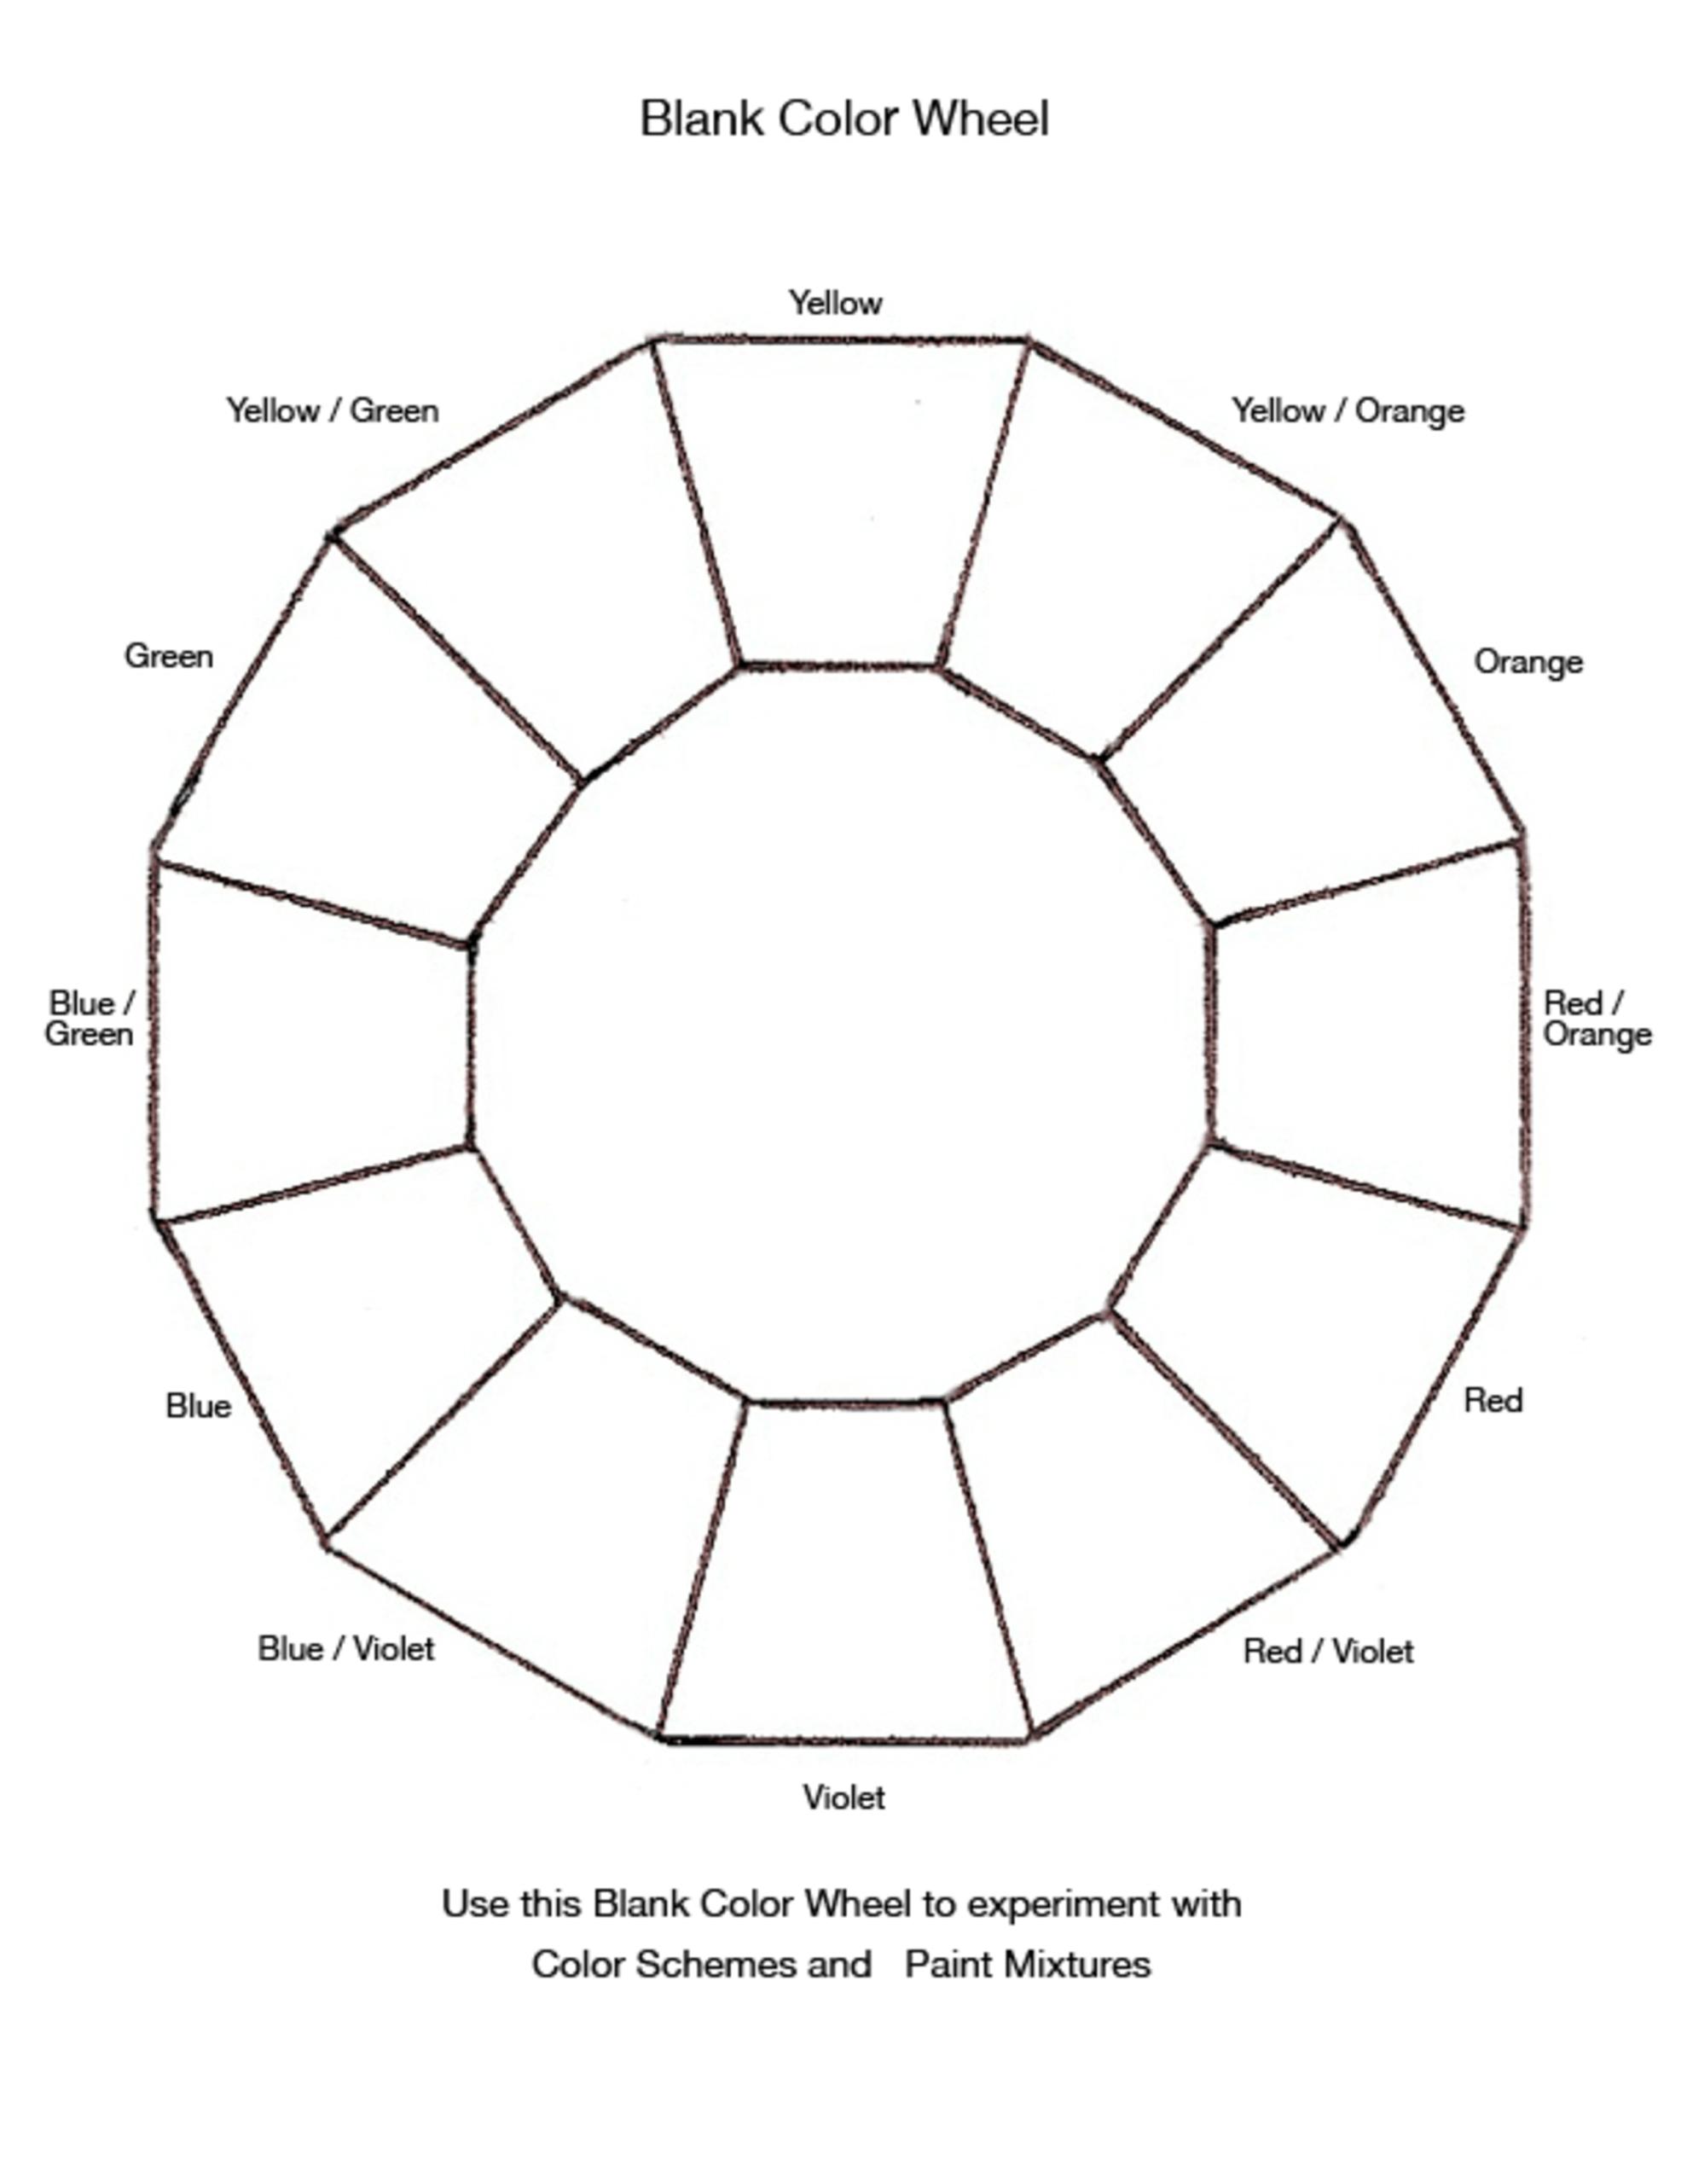 Blank Color Wheel Chart | Templates At Allbusinesstemplates Inside Blank Color Wheel Template